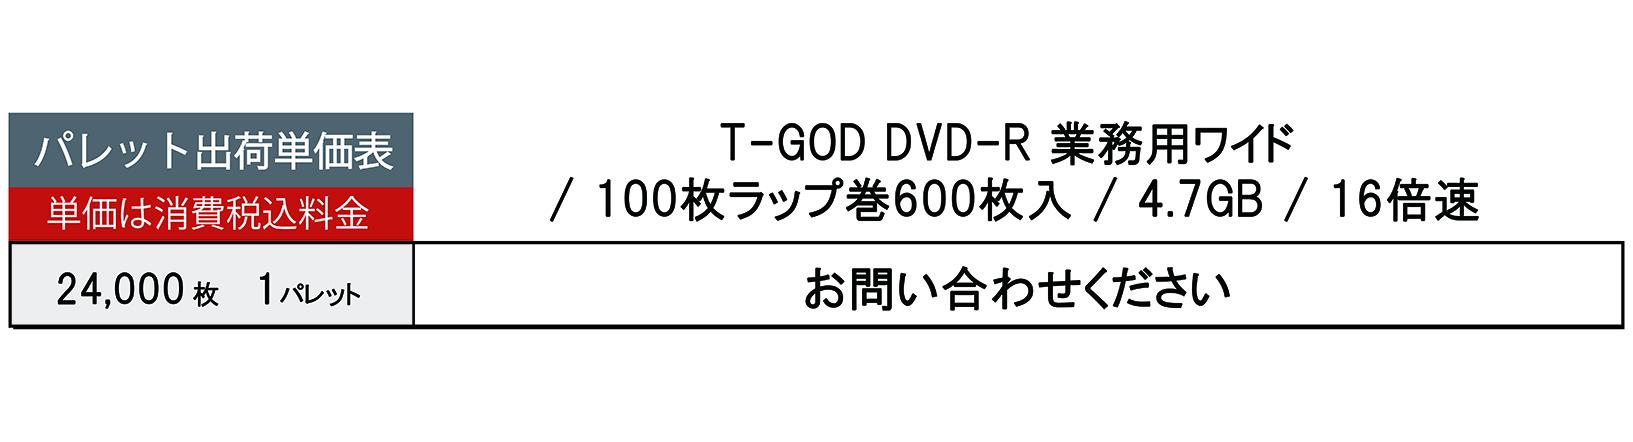 T-GOD大量注文